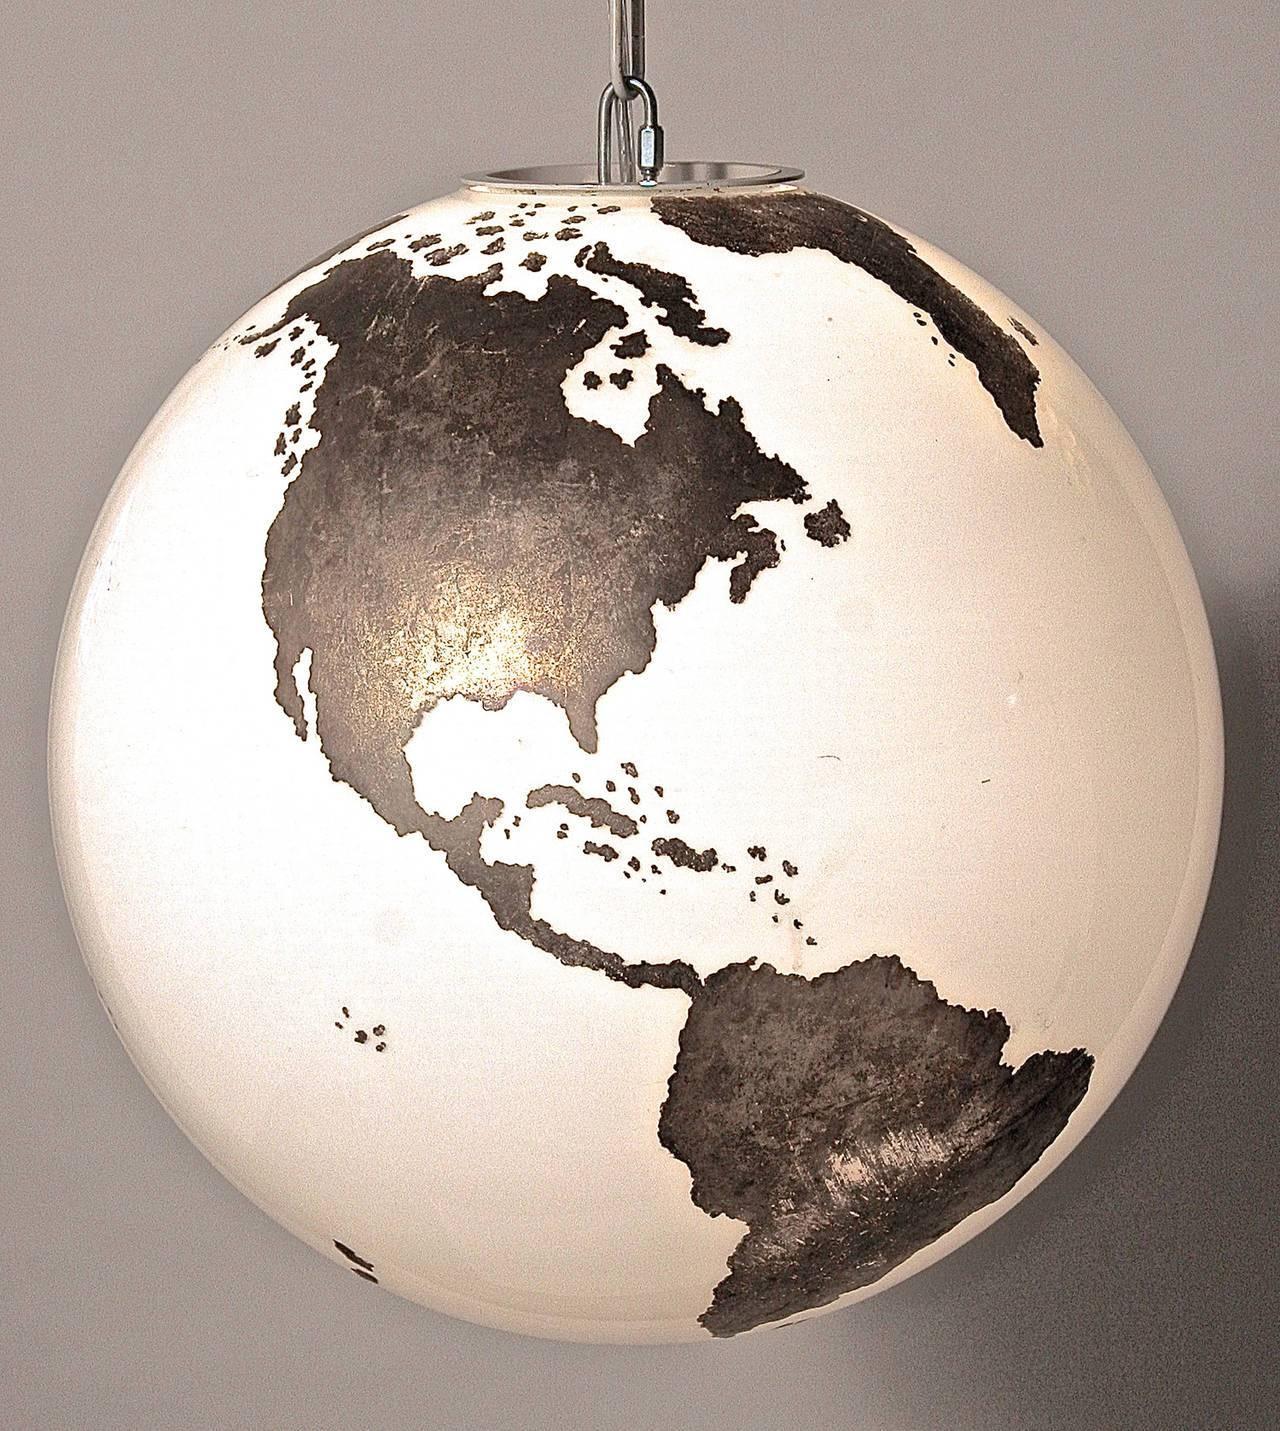 Rare Map Of The World Italian Murano Pendant Light At 1Stdibs inside World Globe Pendant Lights (Image 14 of 15)